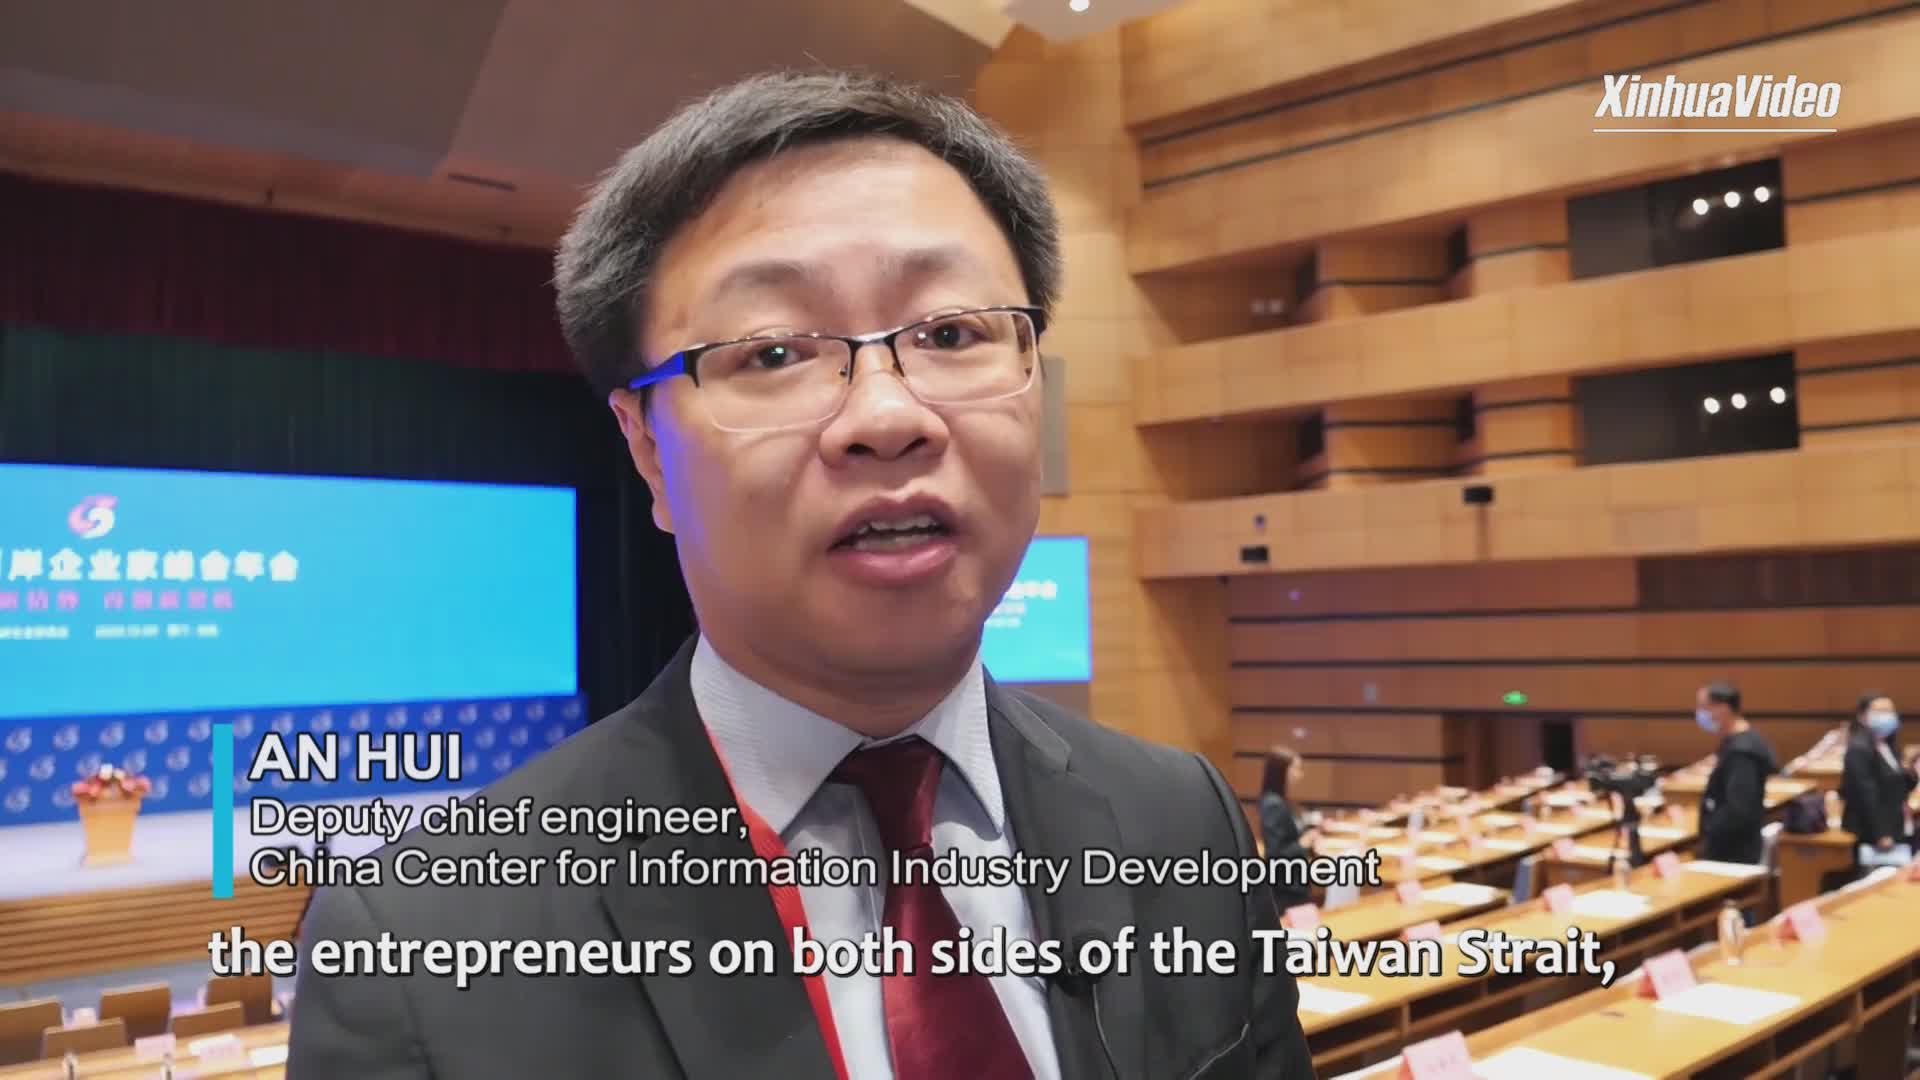 New development blueprint uplifts business leaders, entrepreneurs across Taiwan Strait